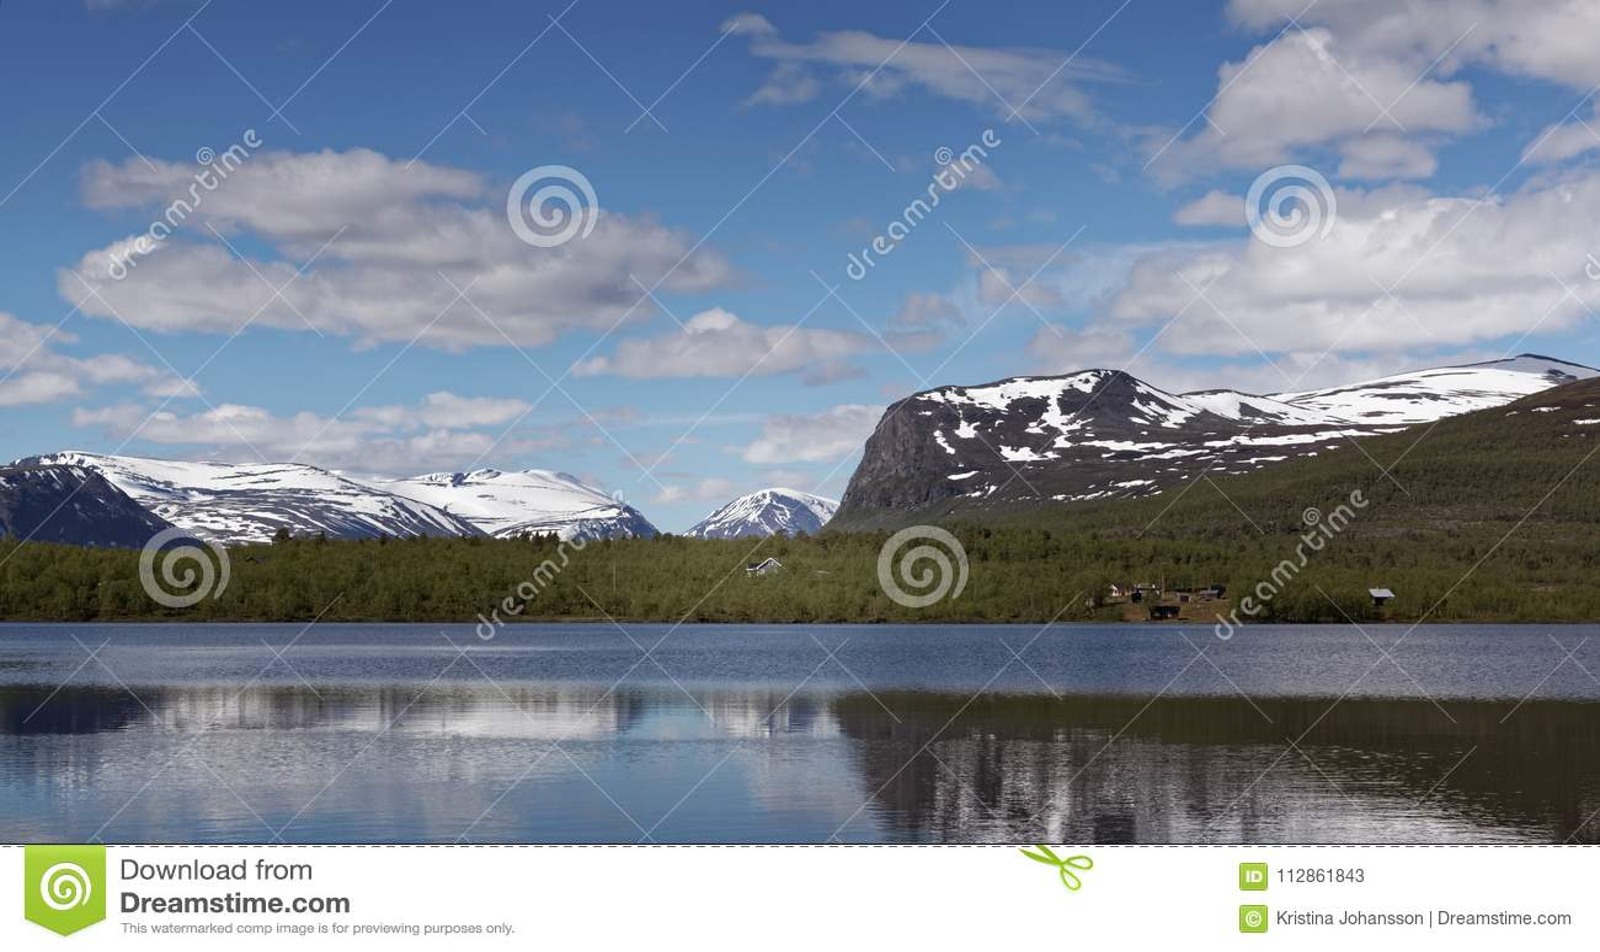 Widok nad Vistasvagge lub Vistasvalley w północnym Szwecja blisko do Nikkaloukta